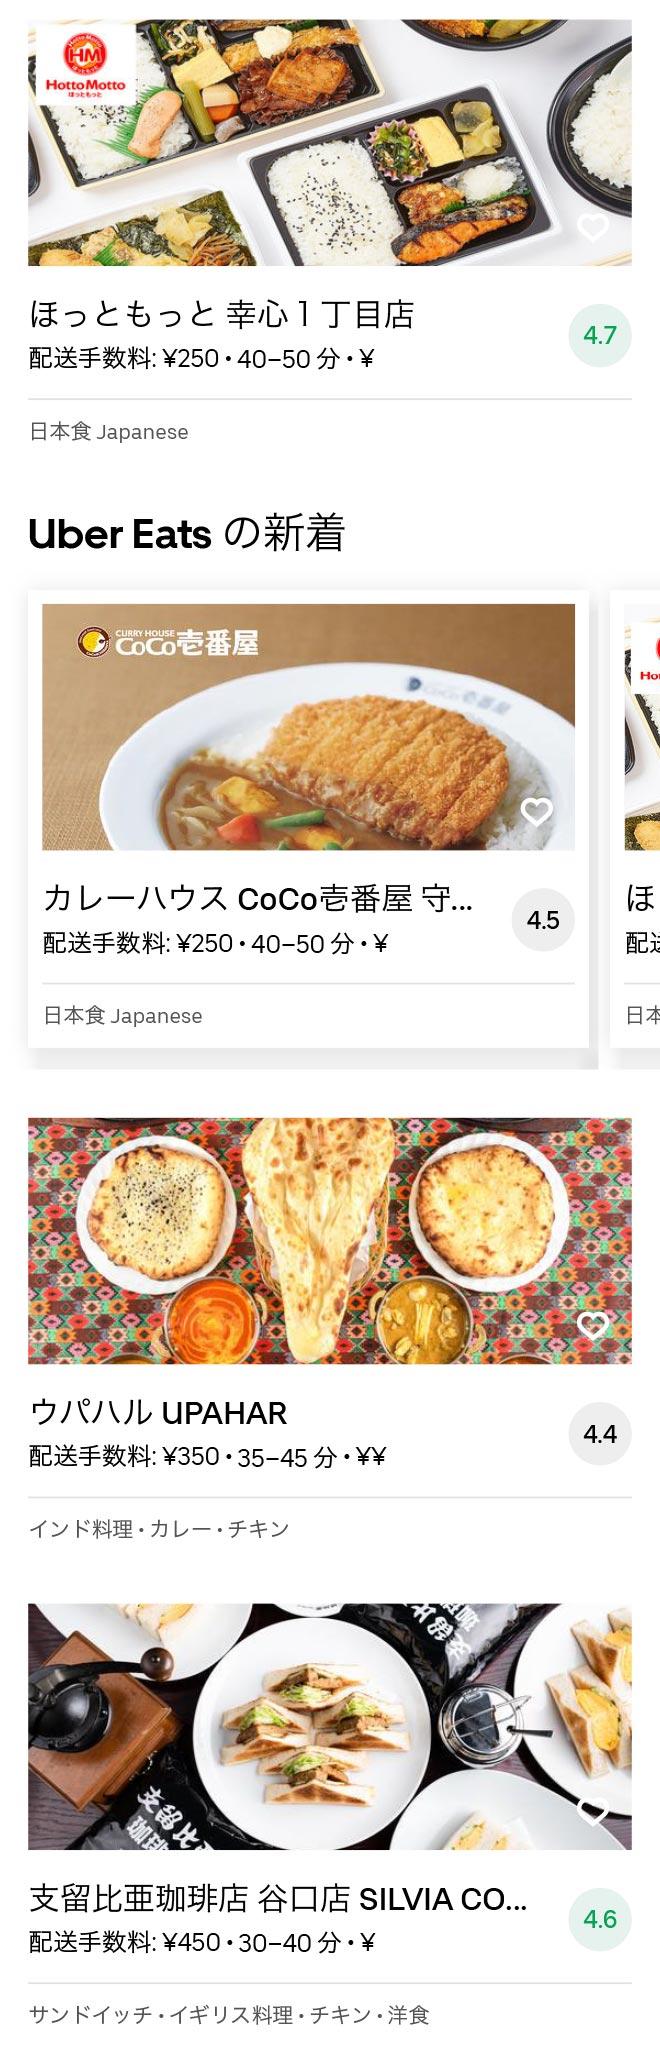 Kachigawa menu 2008 03